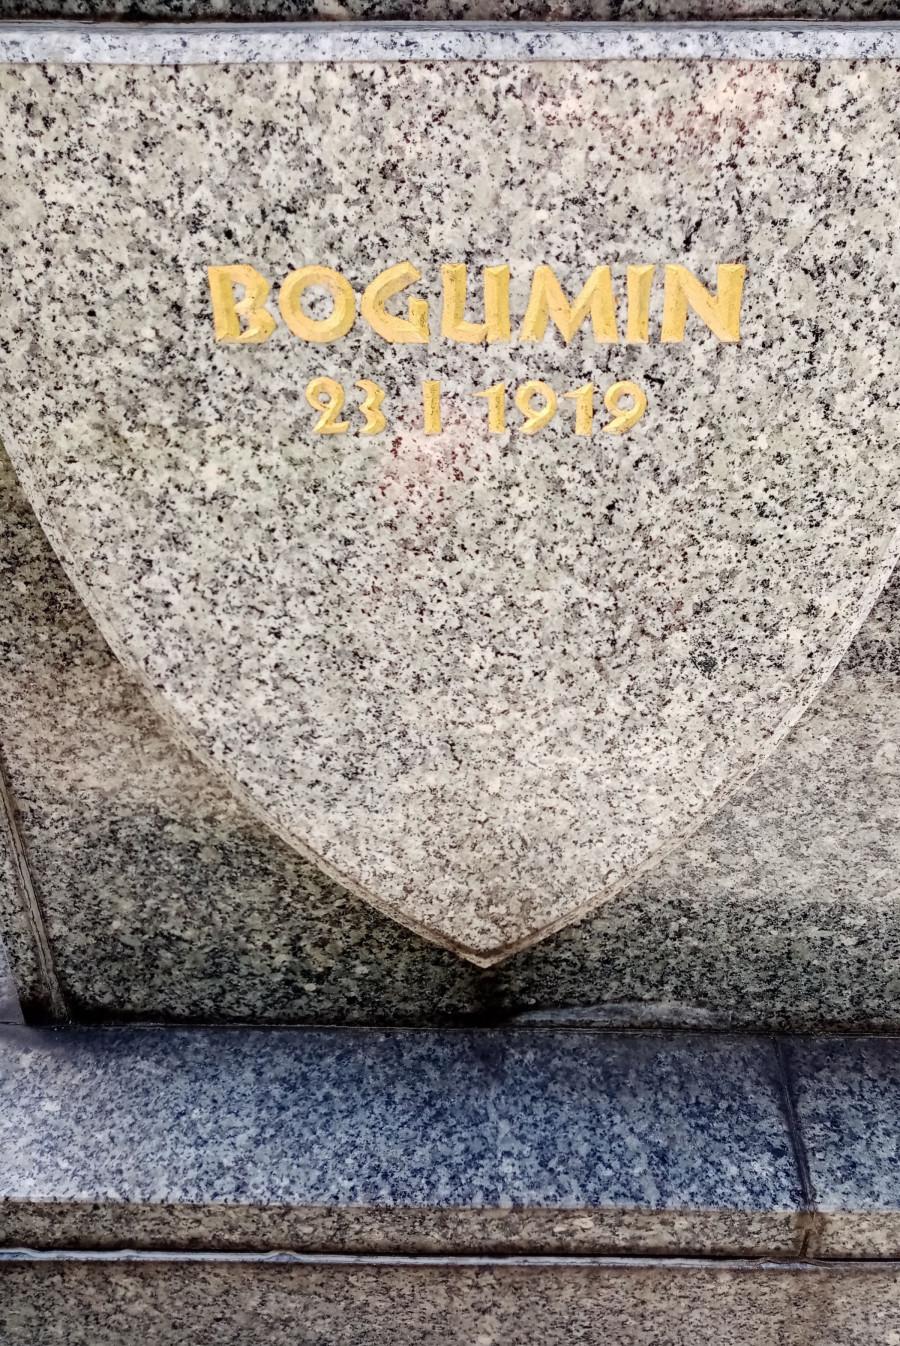 padlí u Bohumína